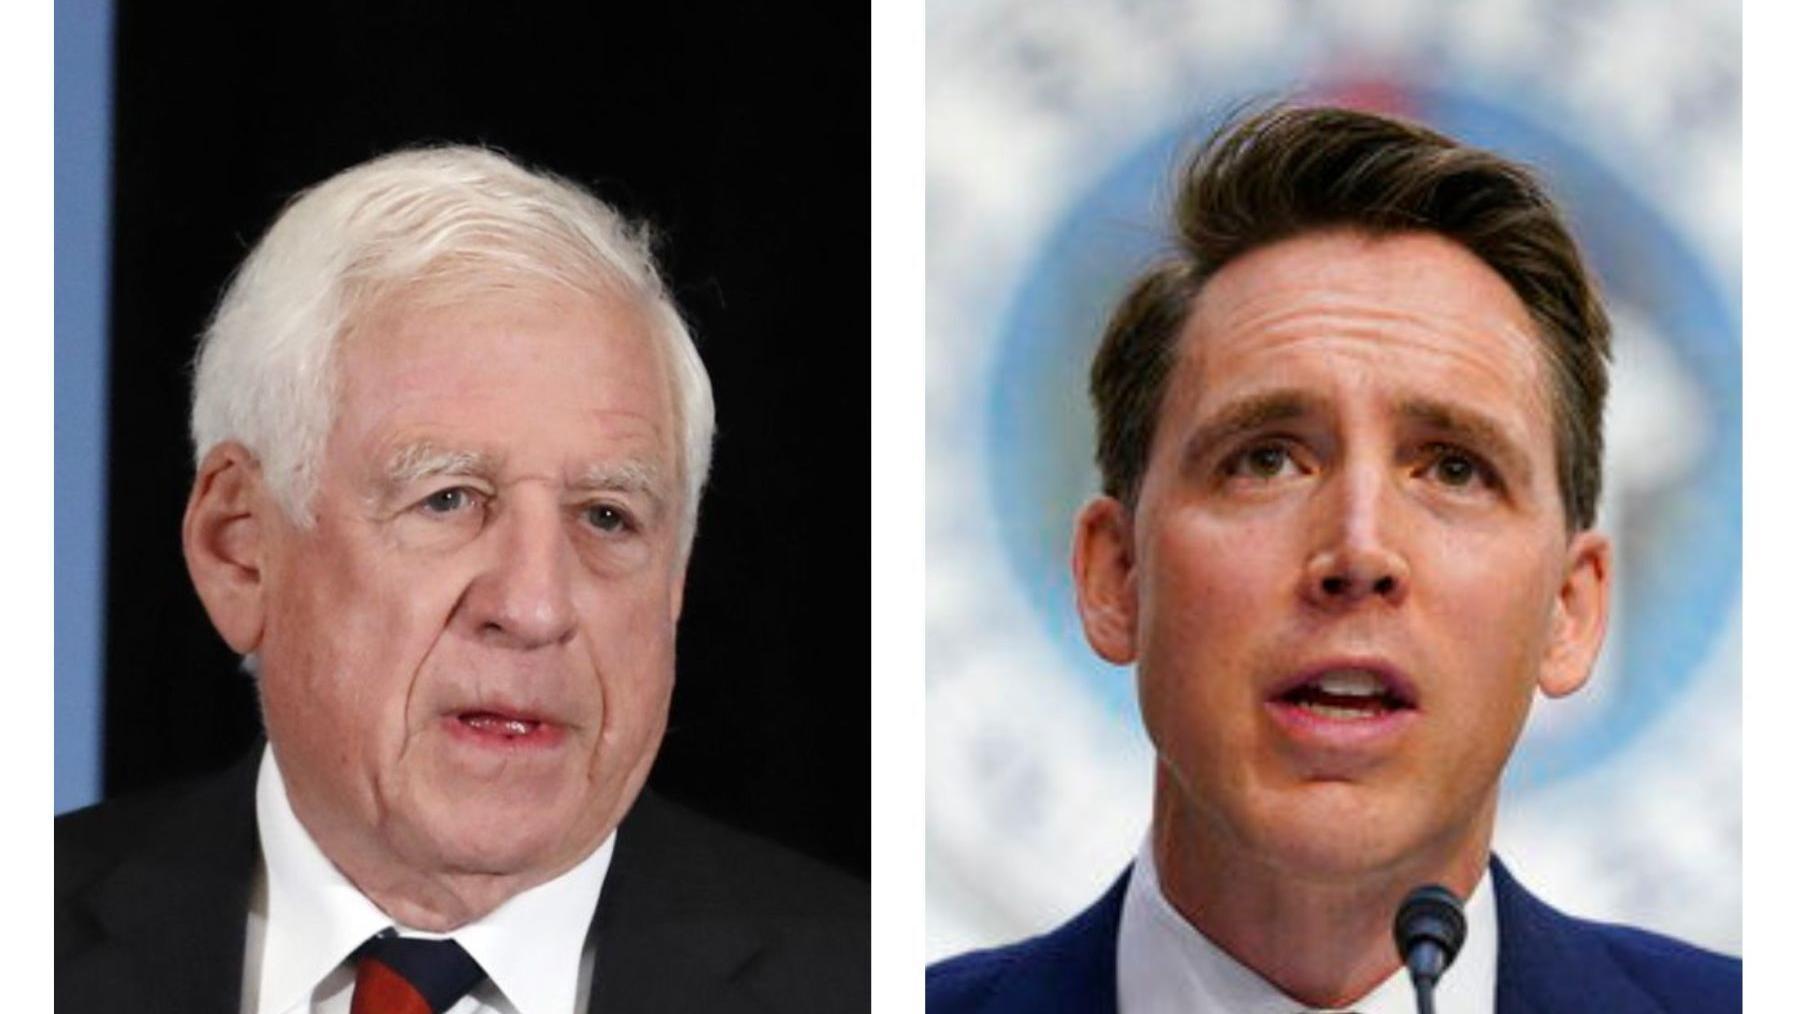 'Conspiracy theories': Former U.S. Sen. John Danforth slams Hawley's challenge to election results